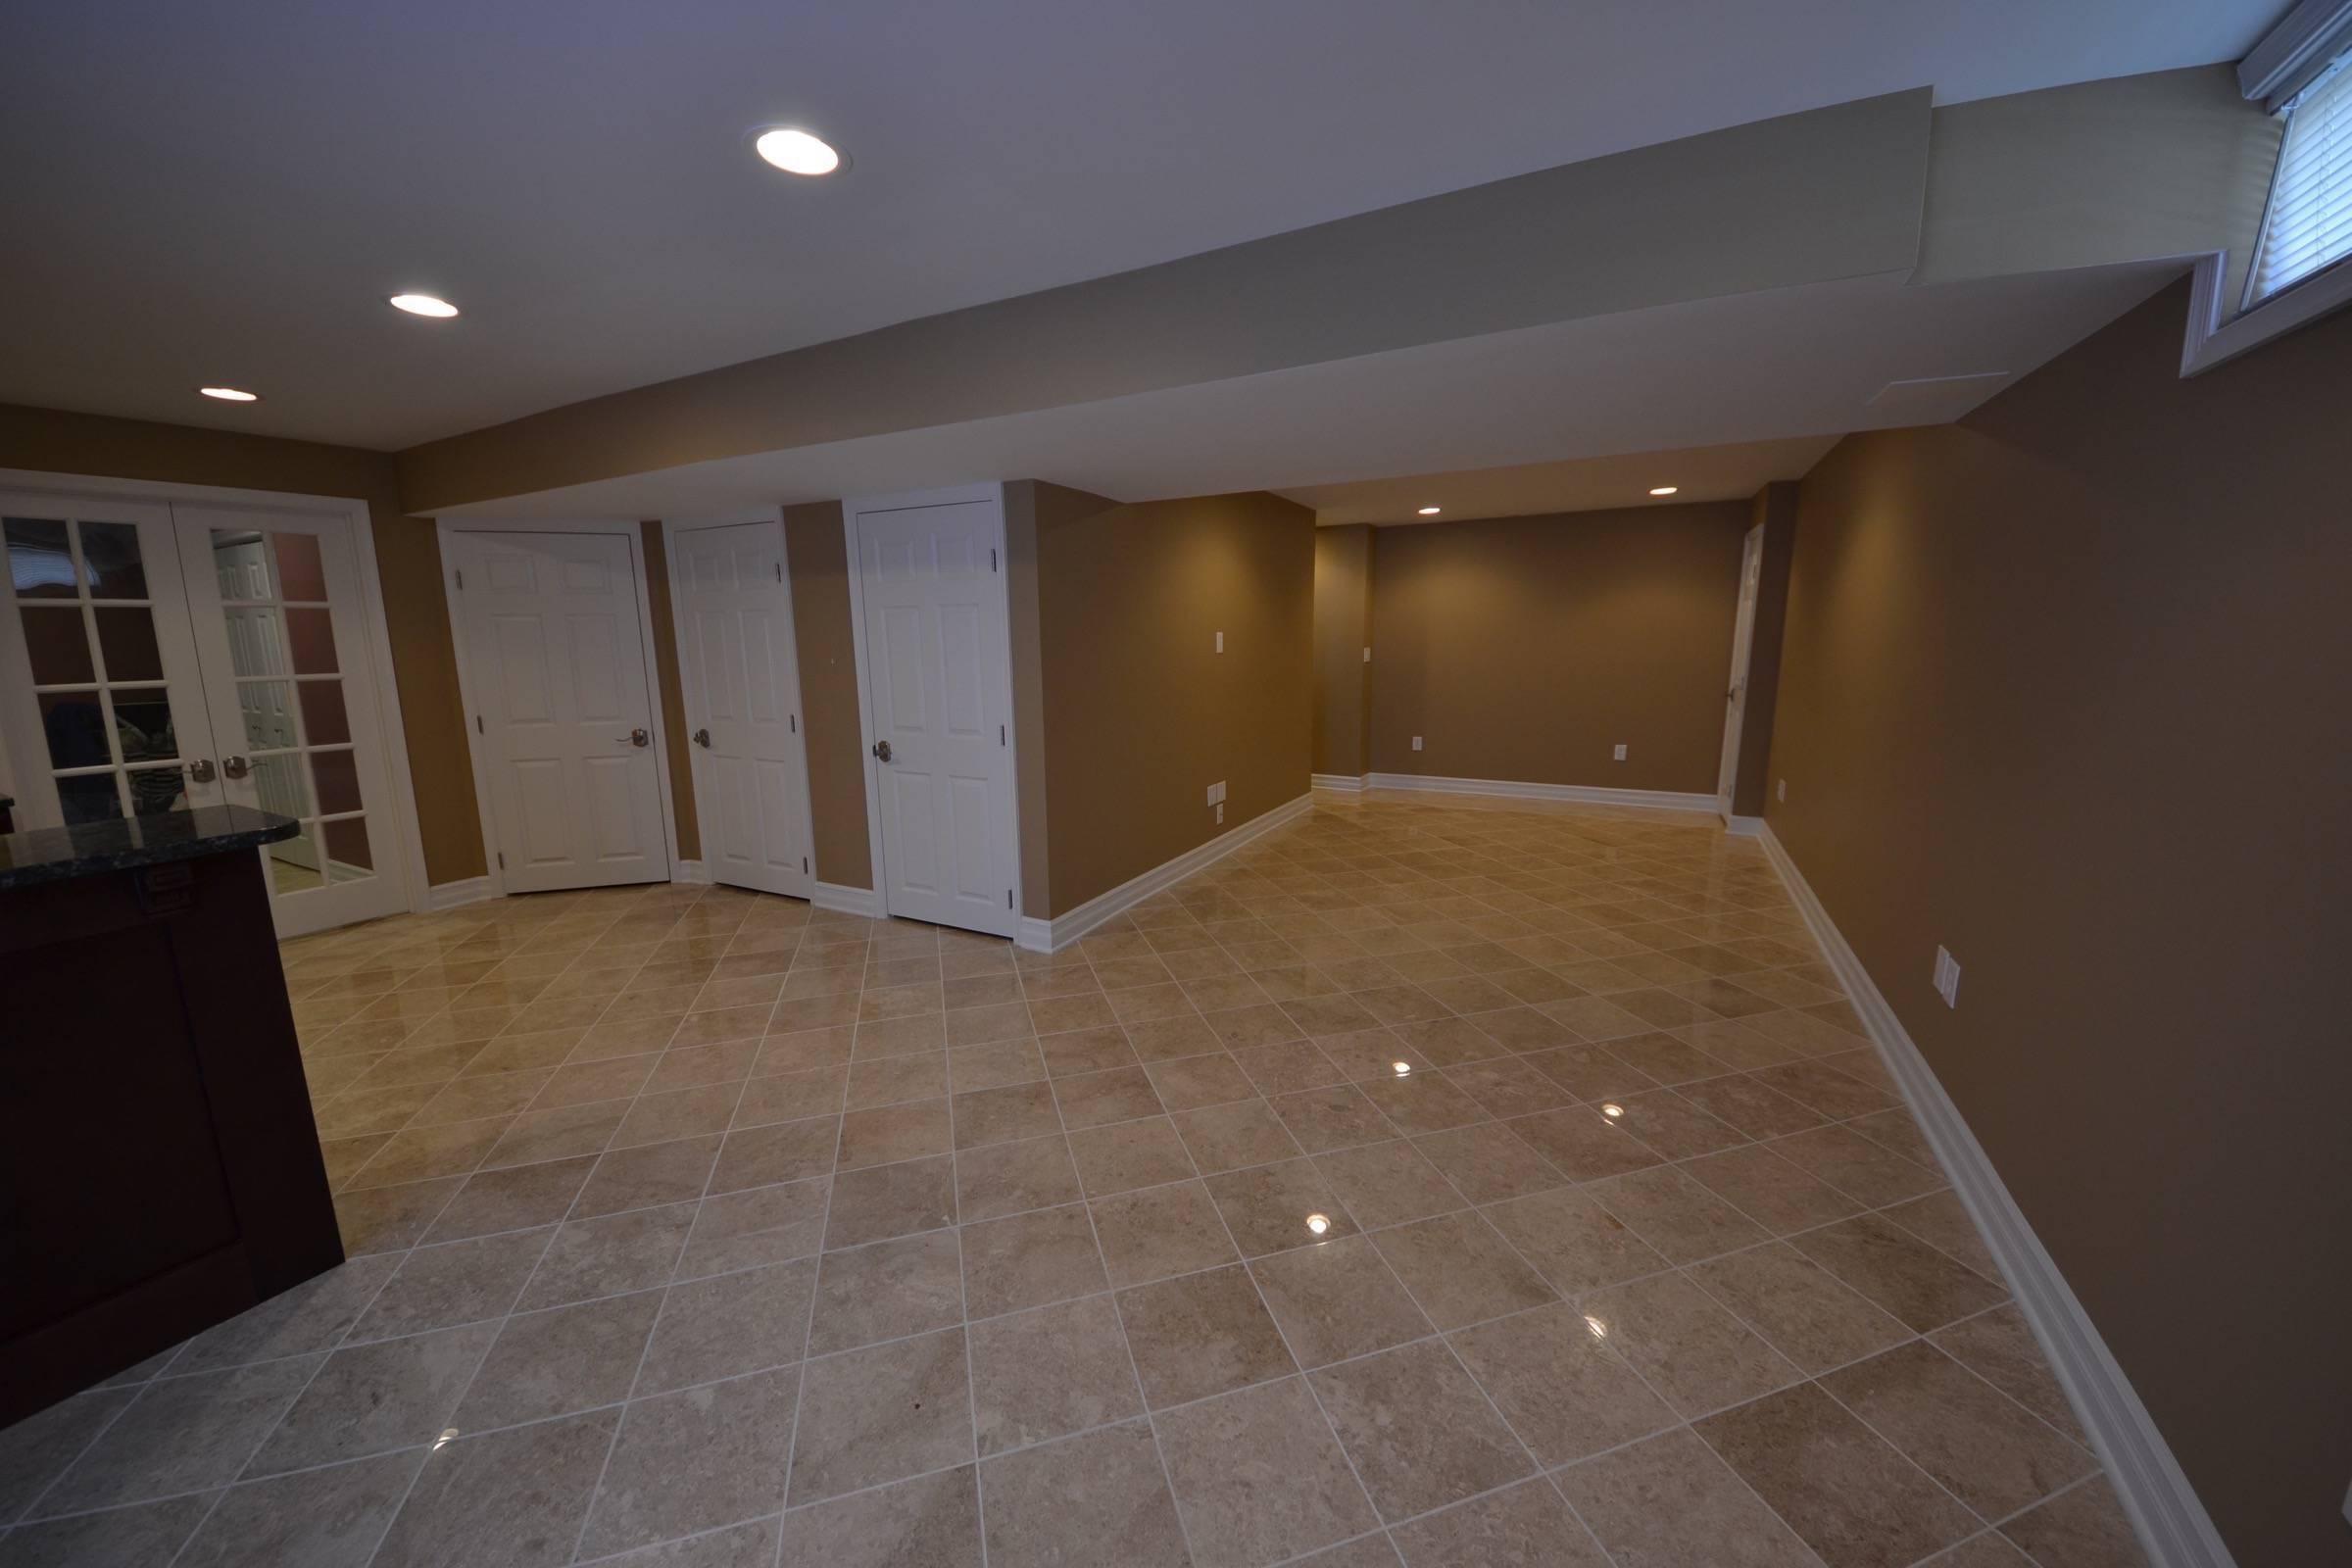 flooring-goias-home-improvement-florexusa (3).jpg